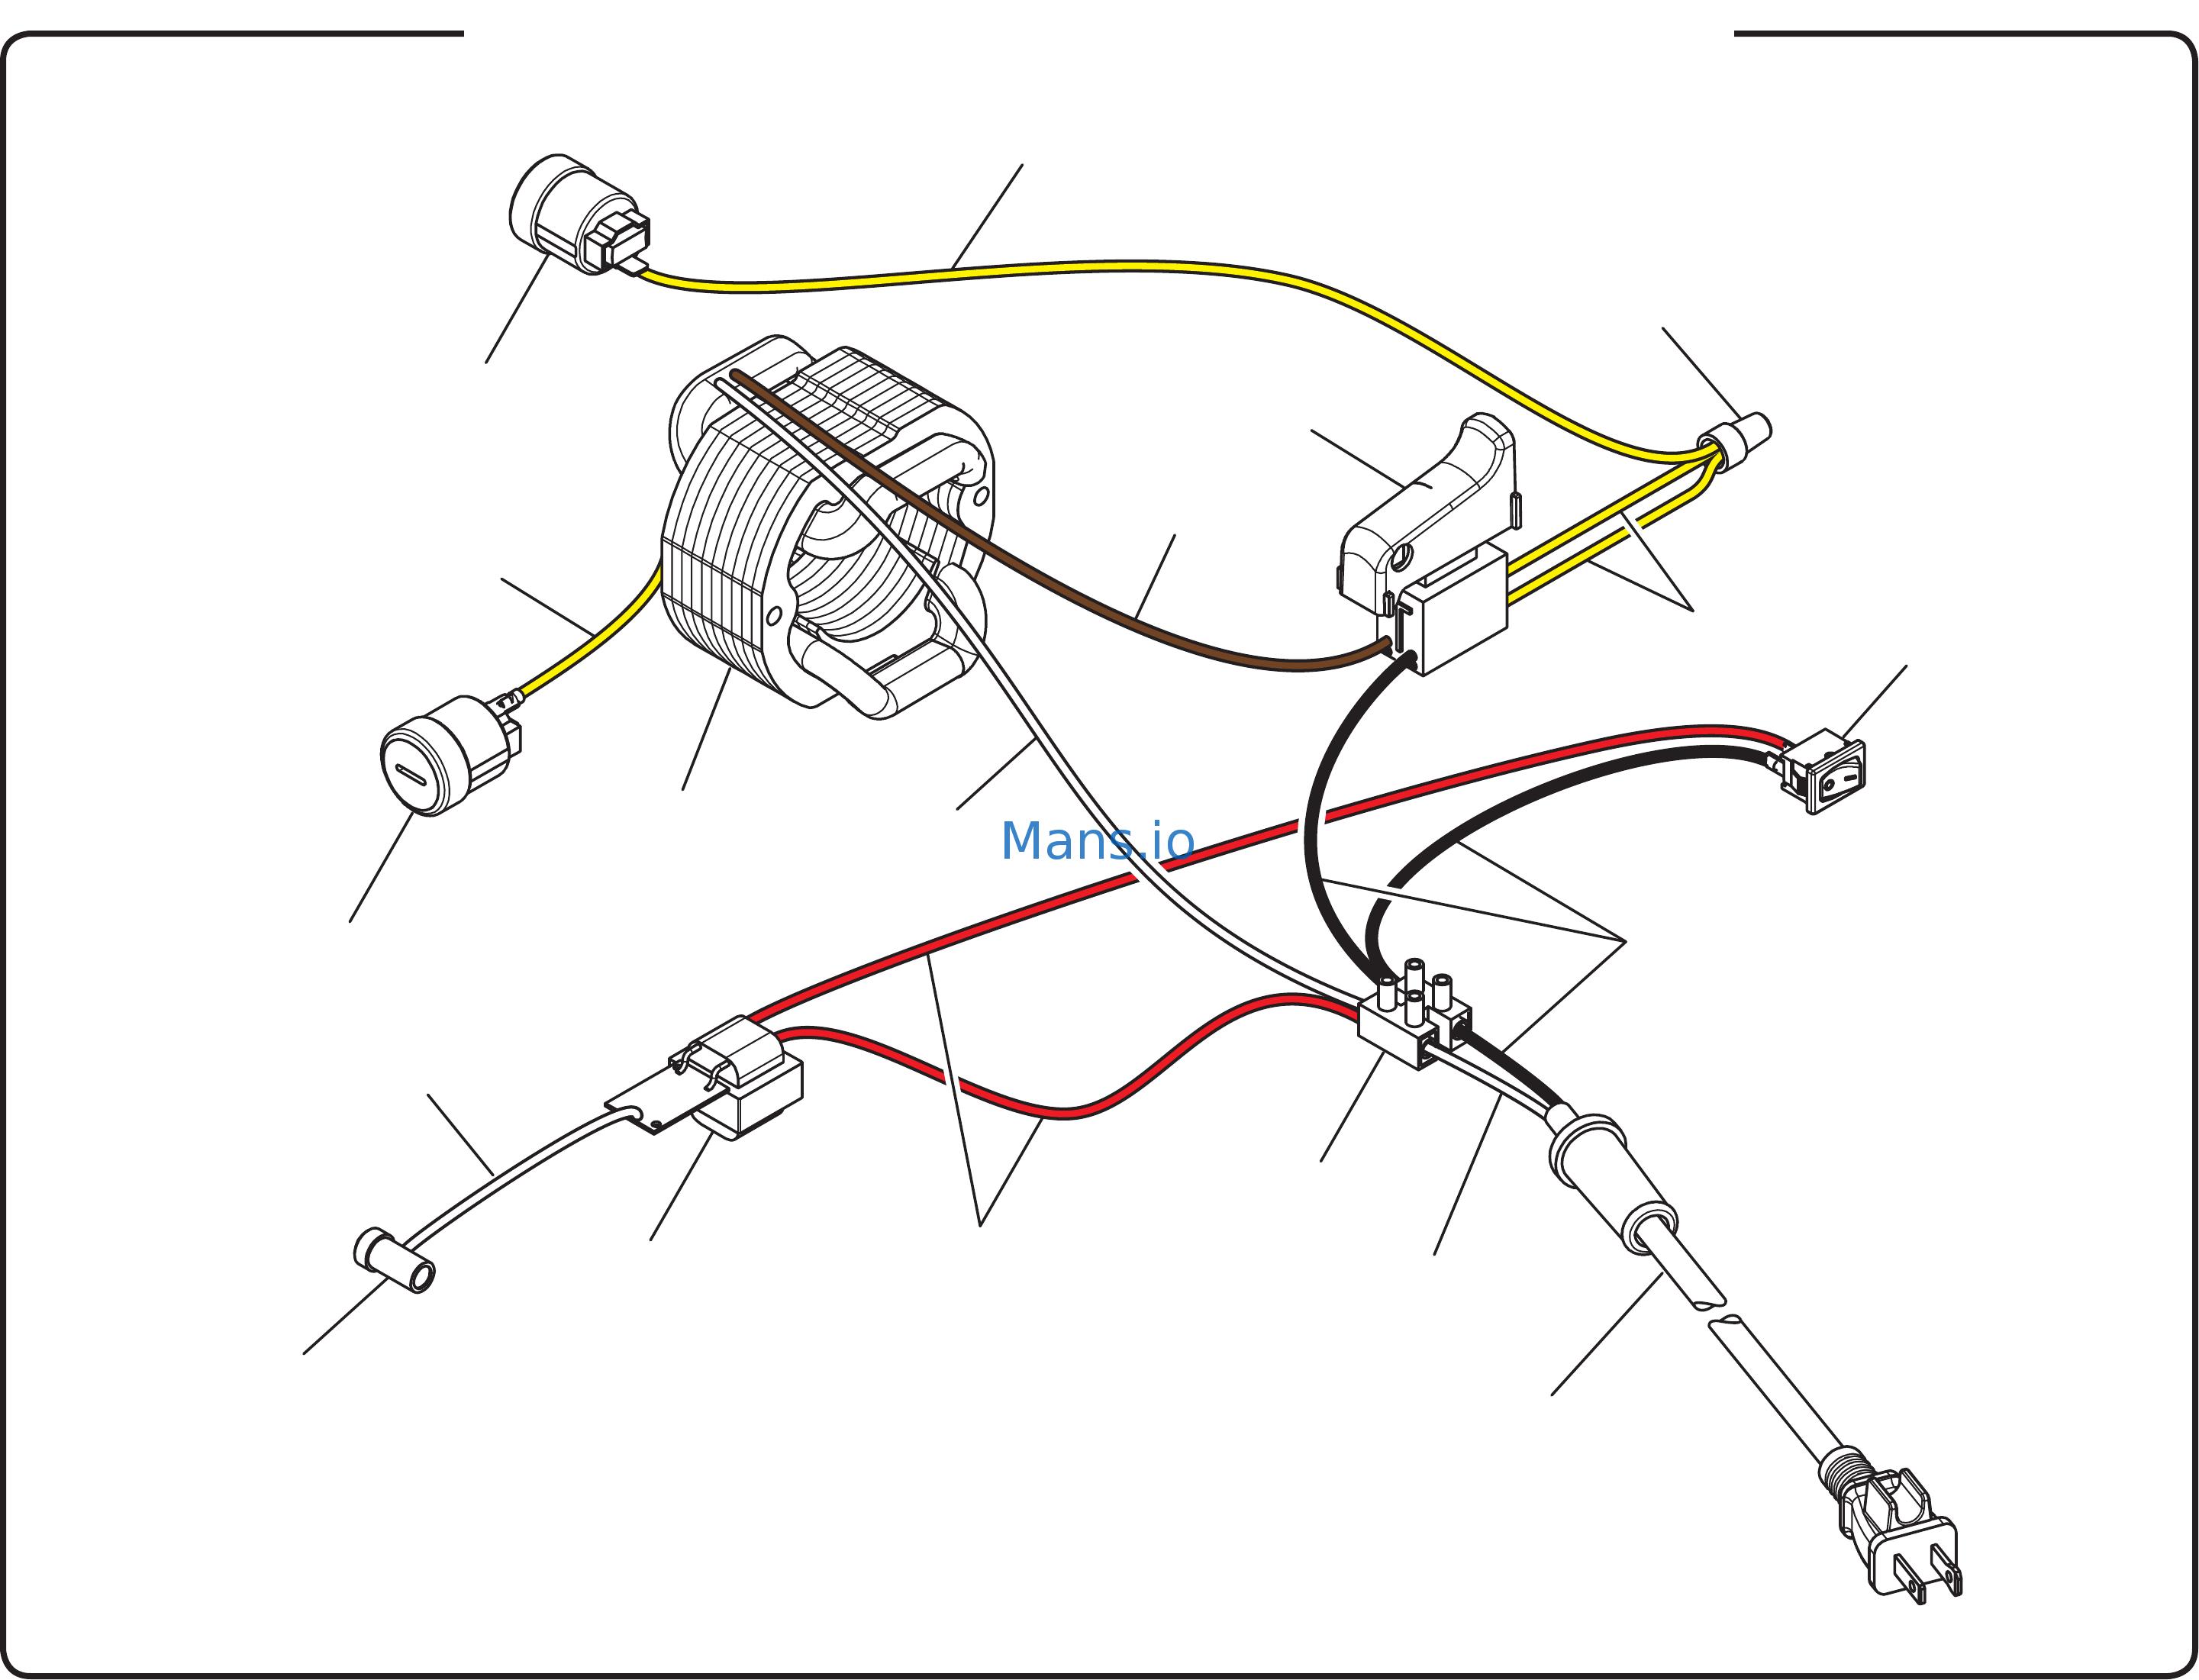 [DIAGRAM] Delta Saw Wiring Diagram FULL Version HD Quality